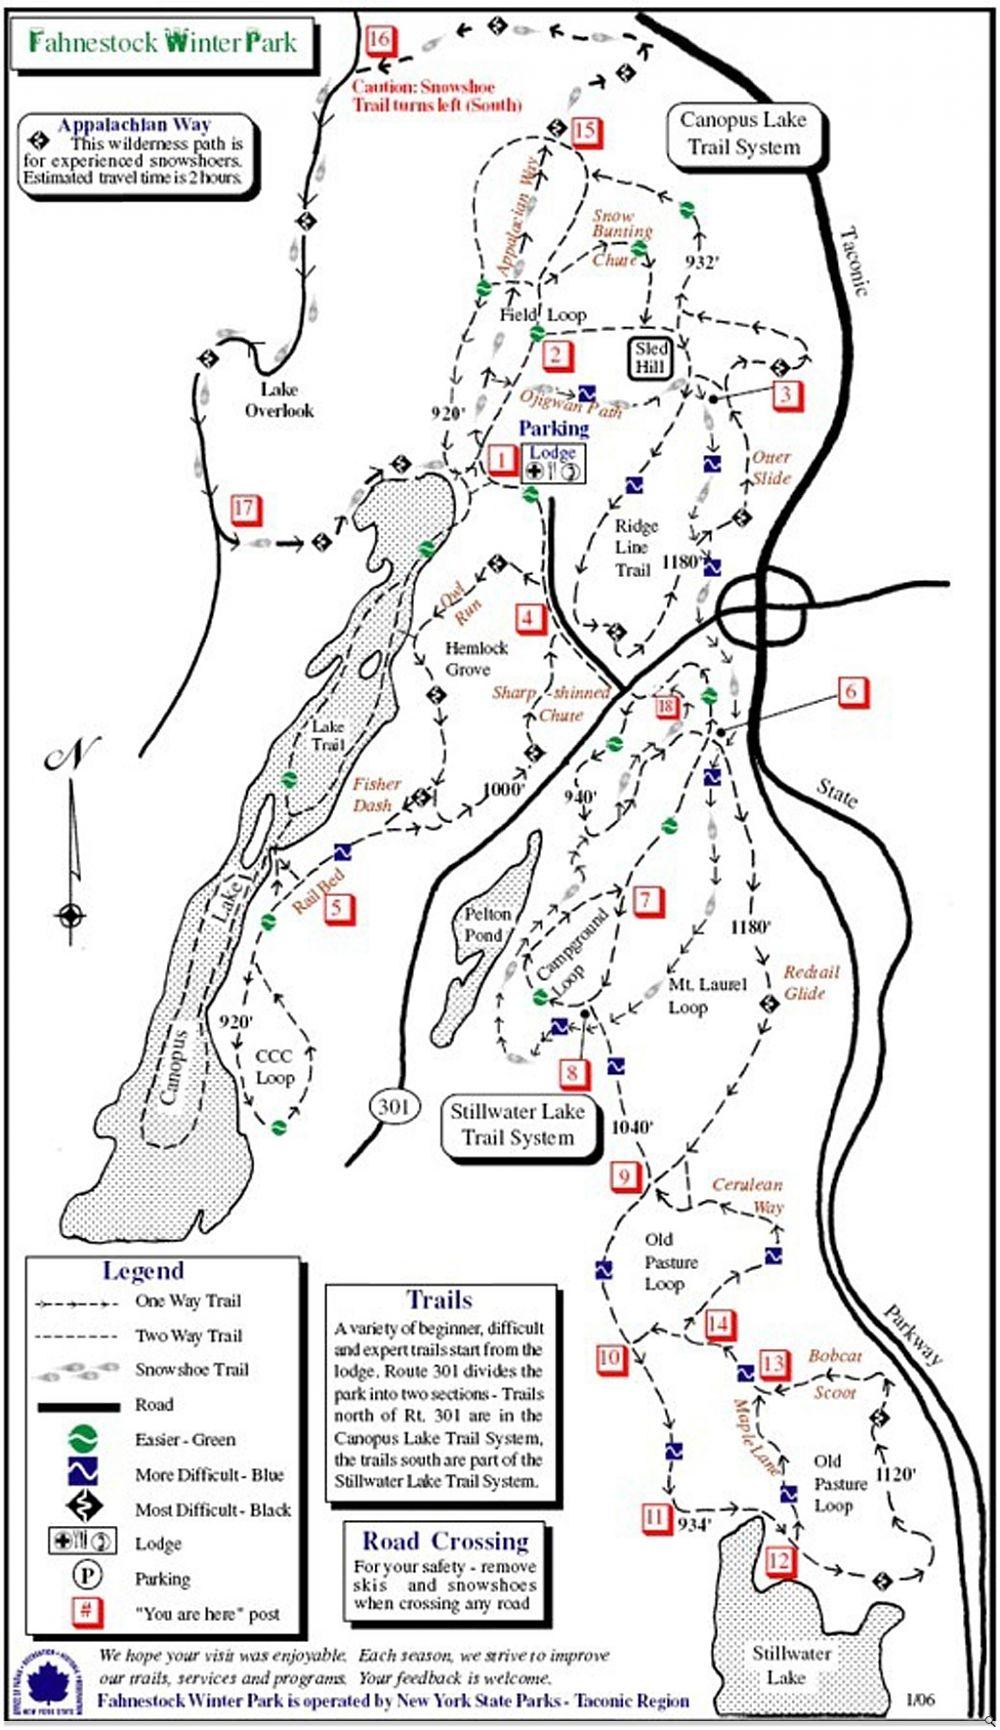 Fahnestock Winter Park trail map